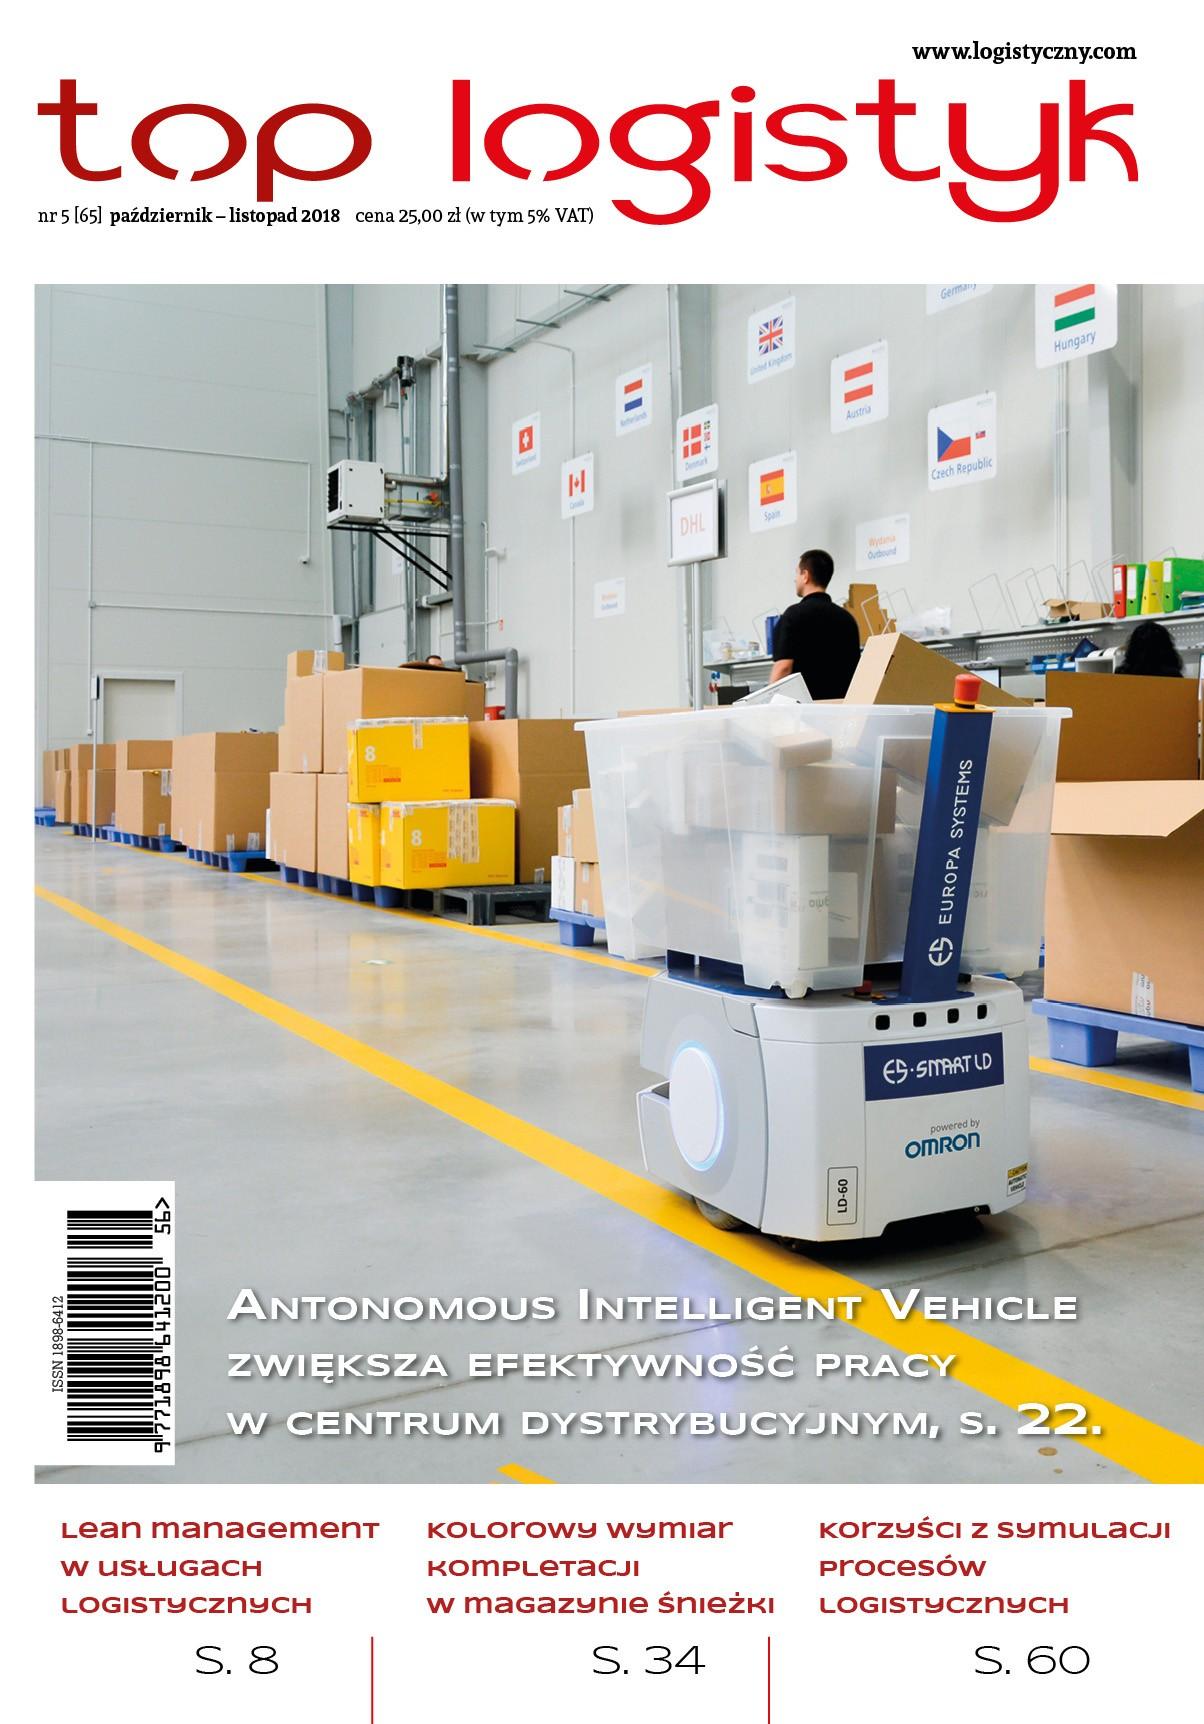 Top Logistyk - Prenumerata